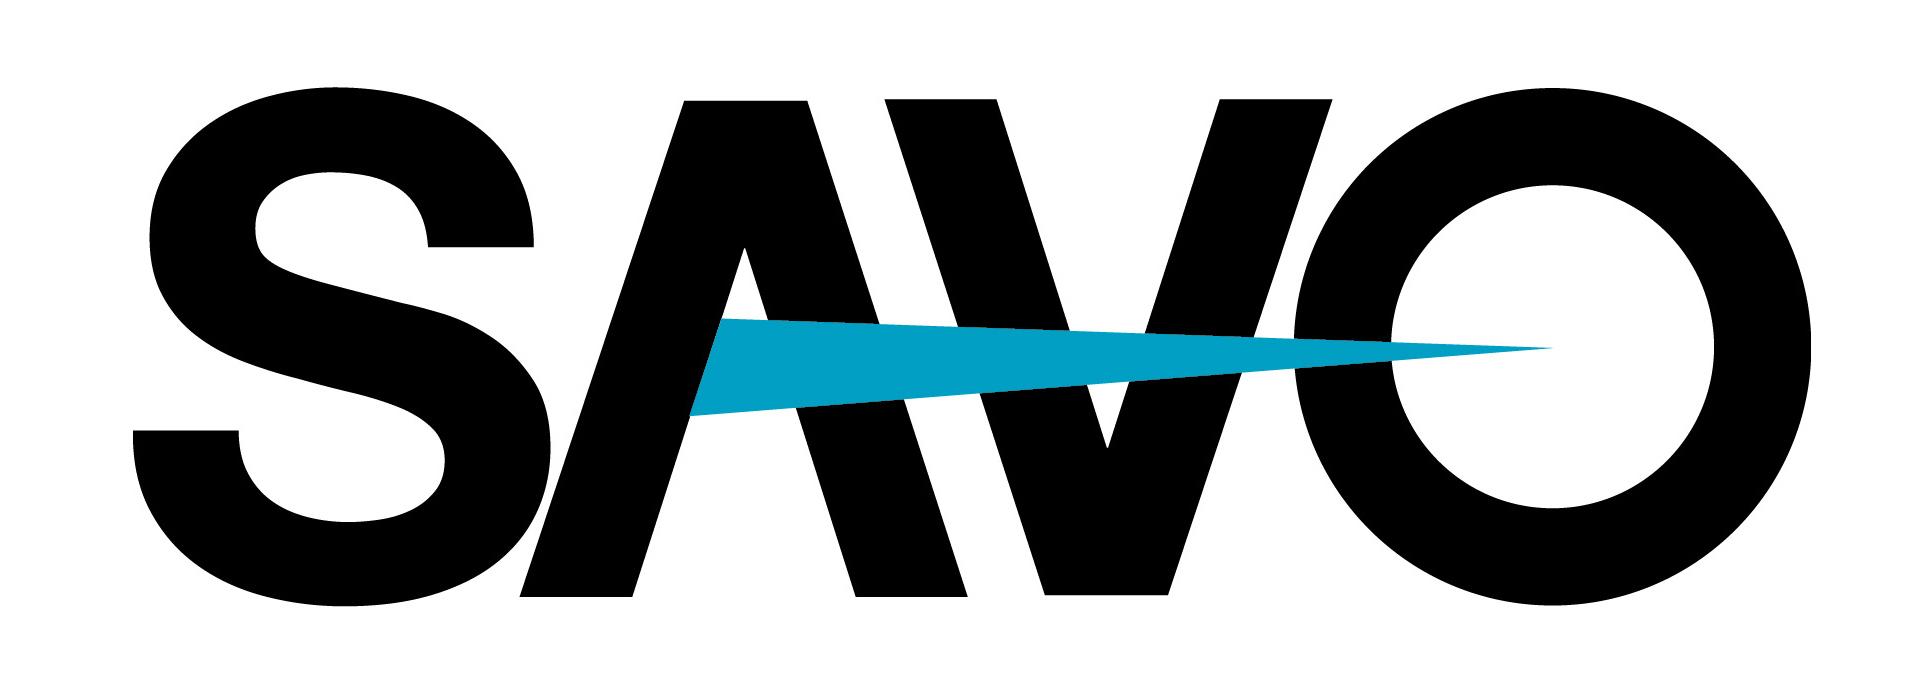 SAVO Group Ltd/The